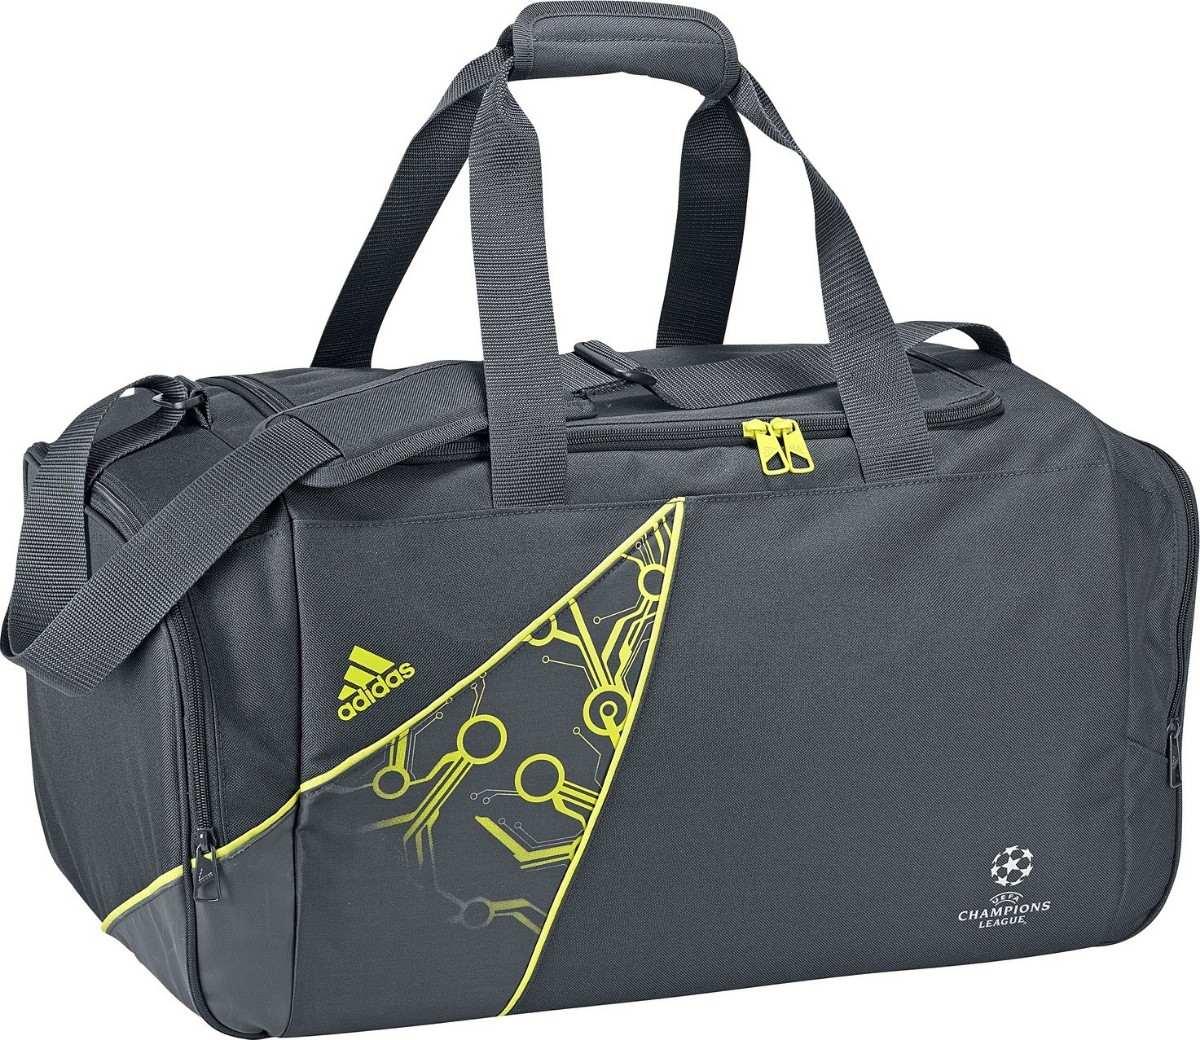 Bolso League Bag Champions Champions Adidas Bolso Adidas League 80mvnONw